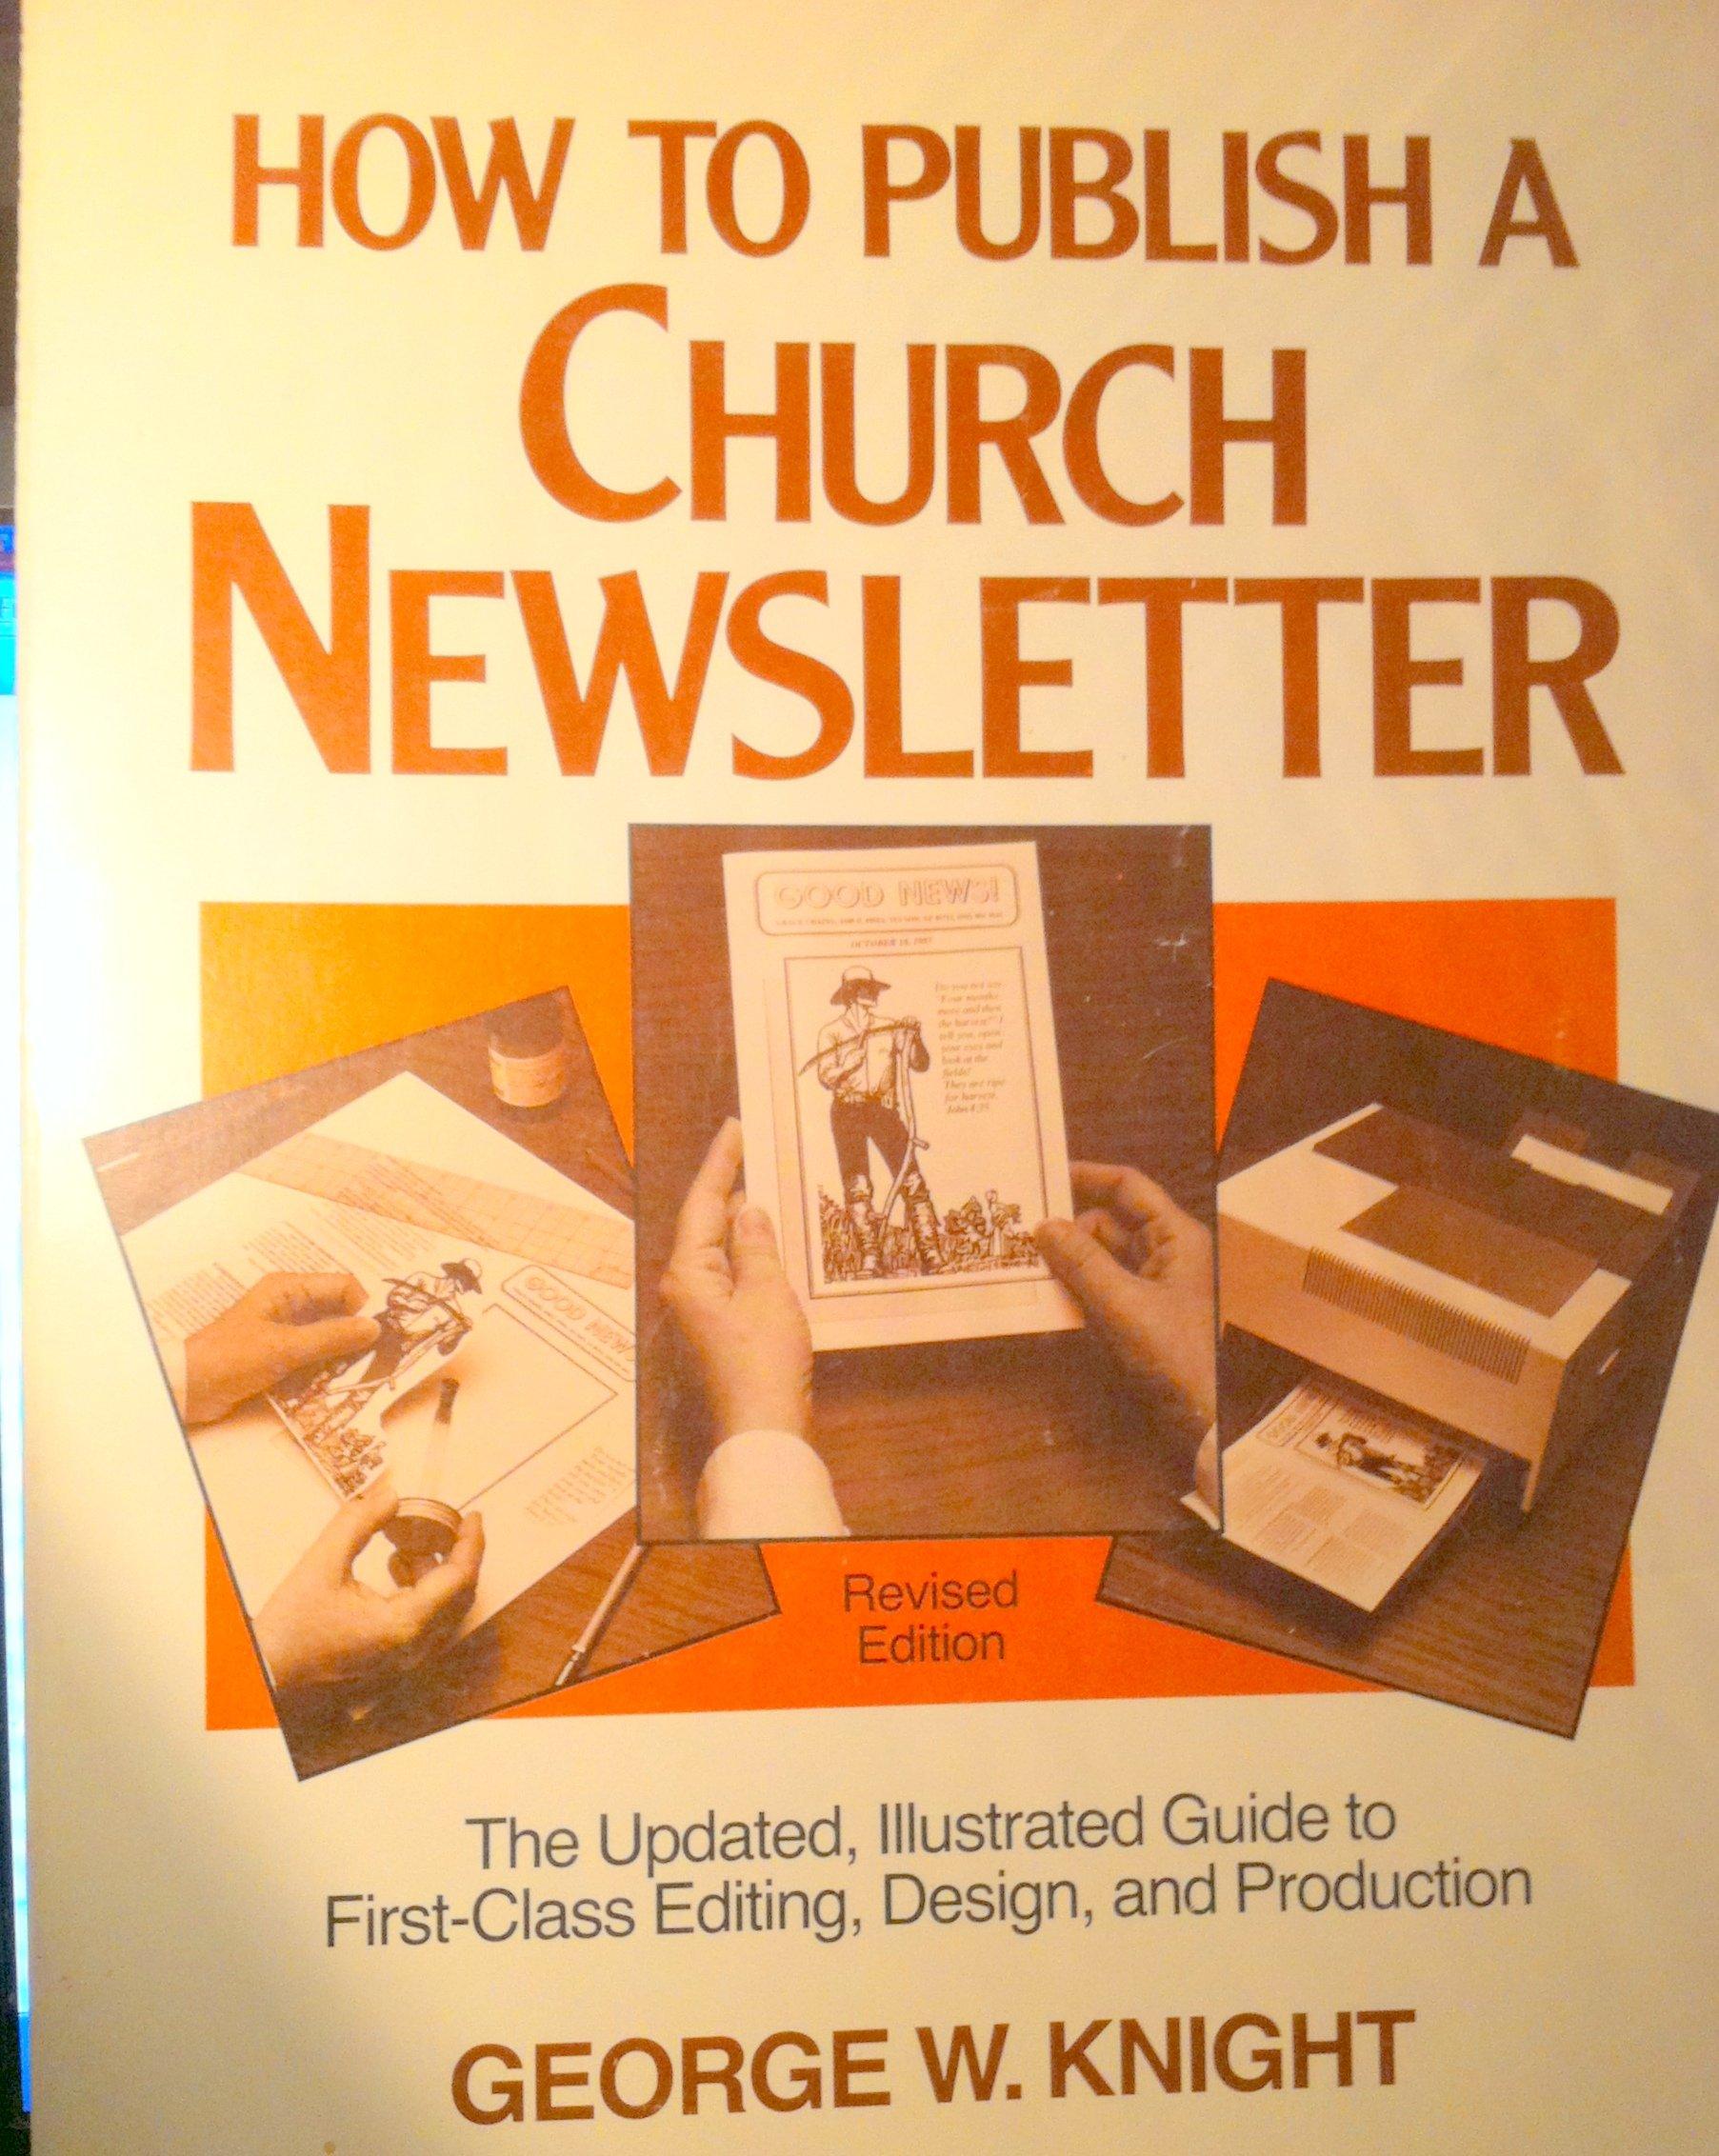 How to Publish a Church Newsletter: Amazon.es: George W. Knight: Libros en idiomas extranjeros